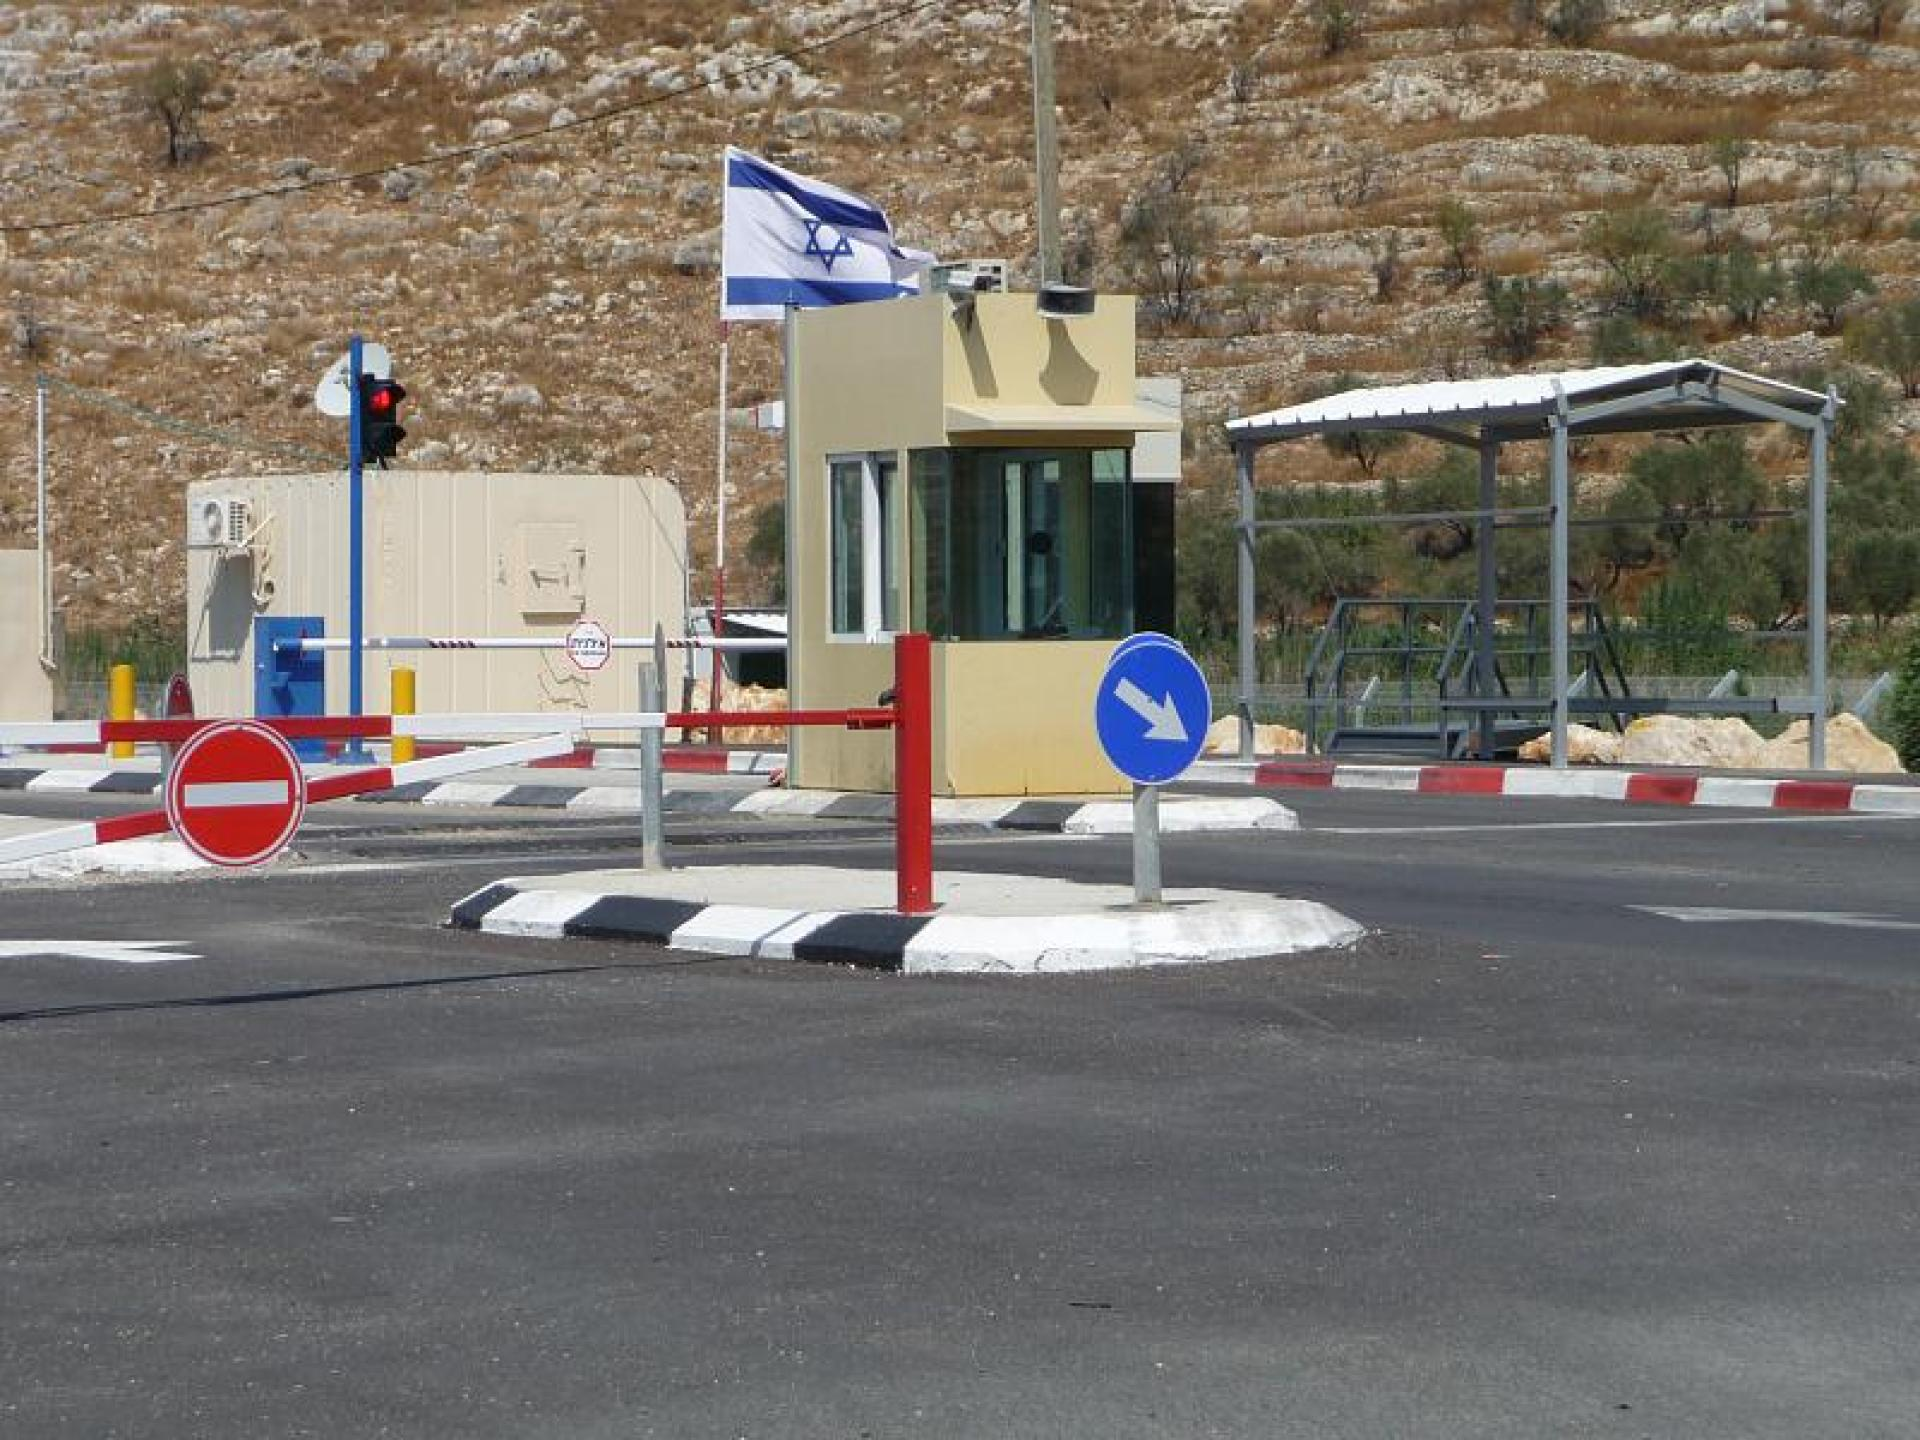 Anabta checkpoint 26.09.09